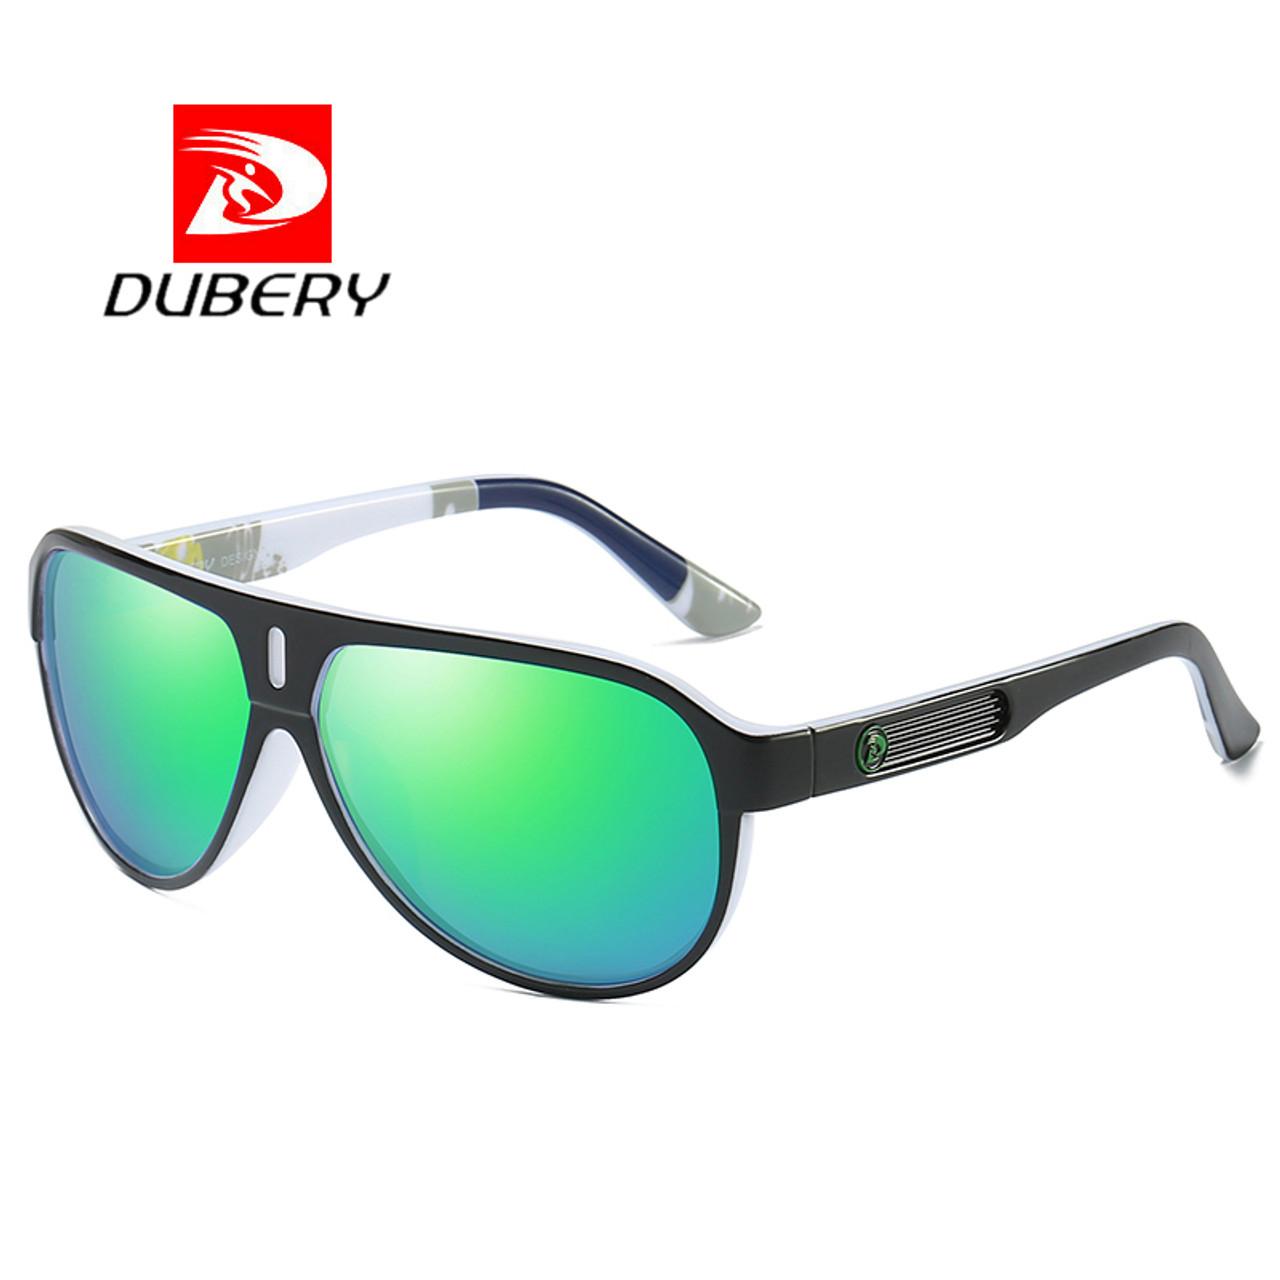 1d4e7dad0d8 ... DUBERY 2018 Sport Sunglasses Polarized For Men Sun Glasses Goggle  Driving Personality Color Mirror Luxury Brand ...